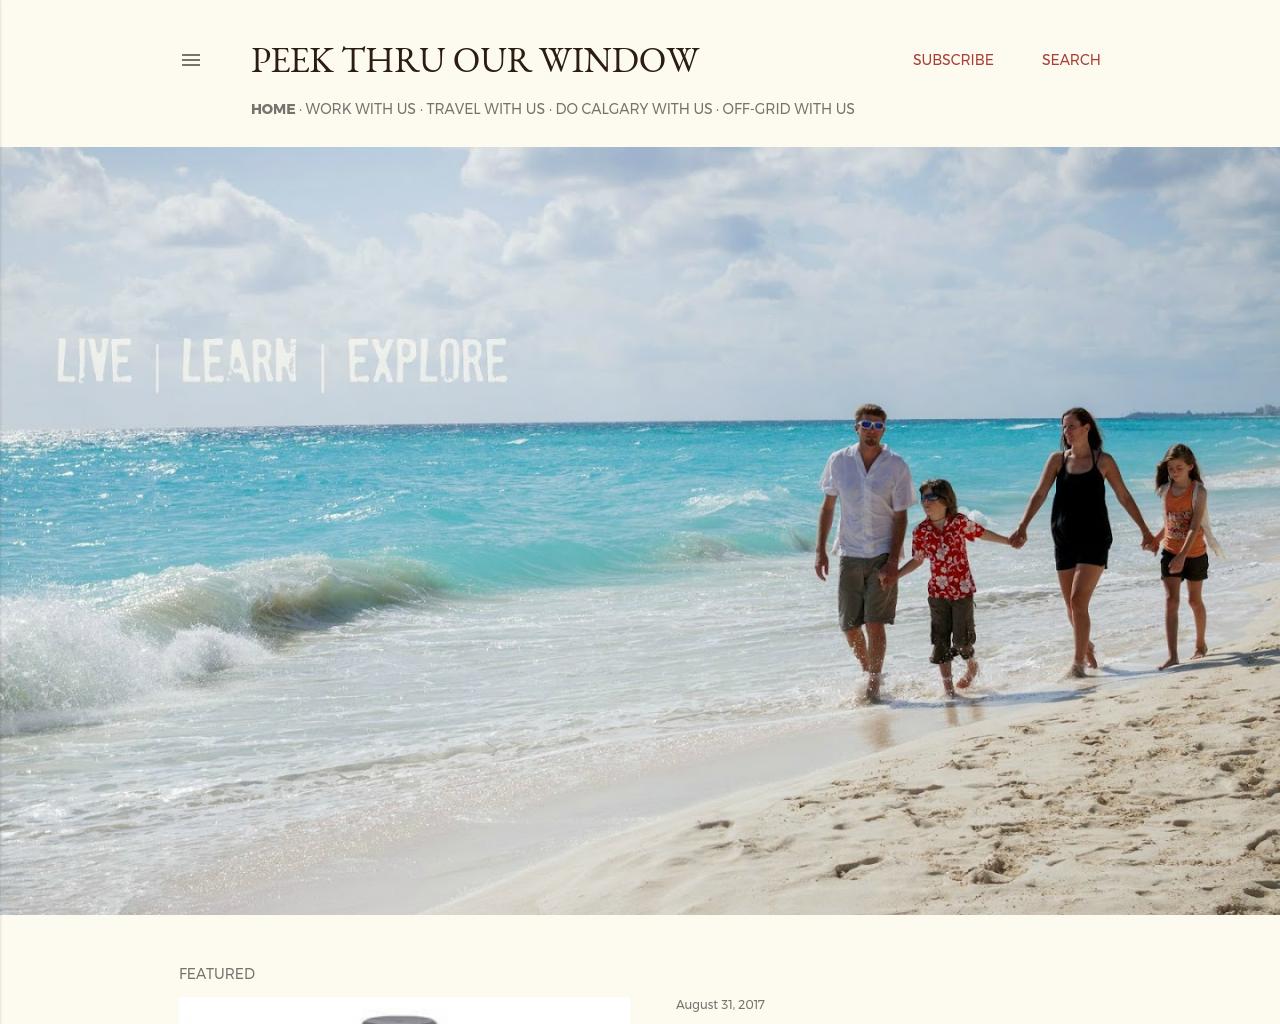 Peek-Thru-Our-Window-Advertising-Reviews-Pricing